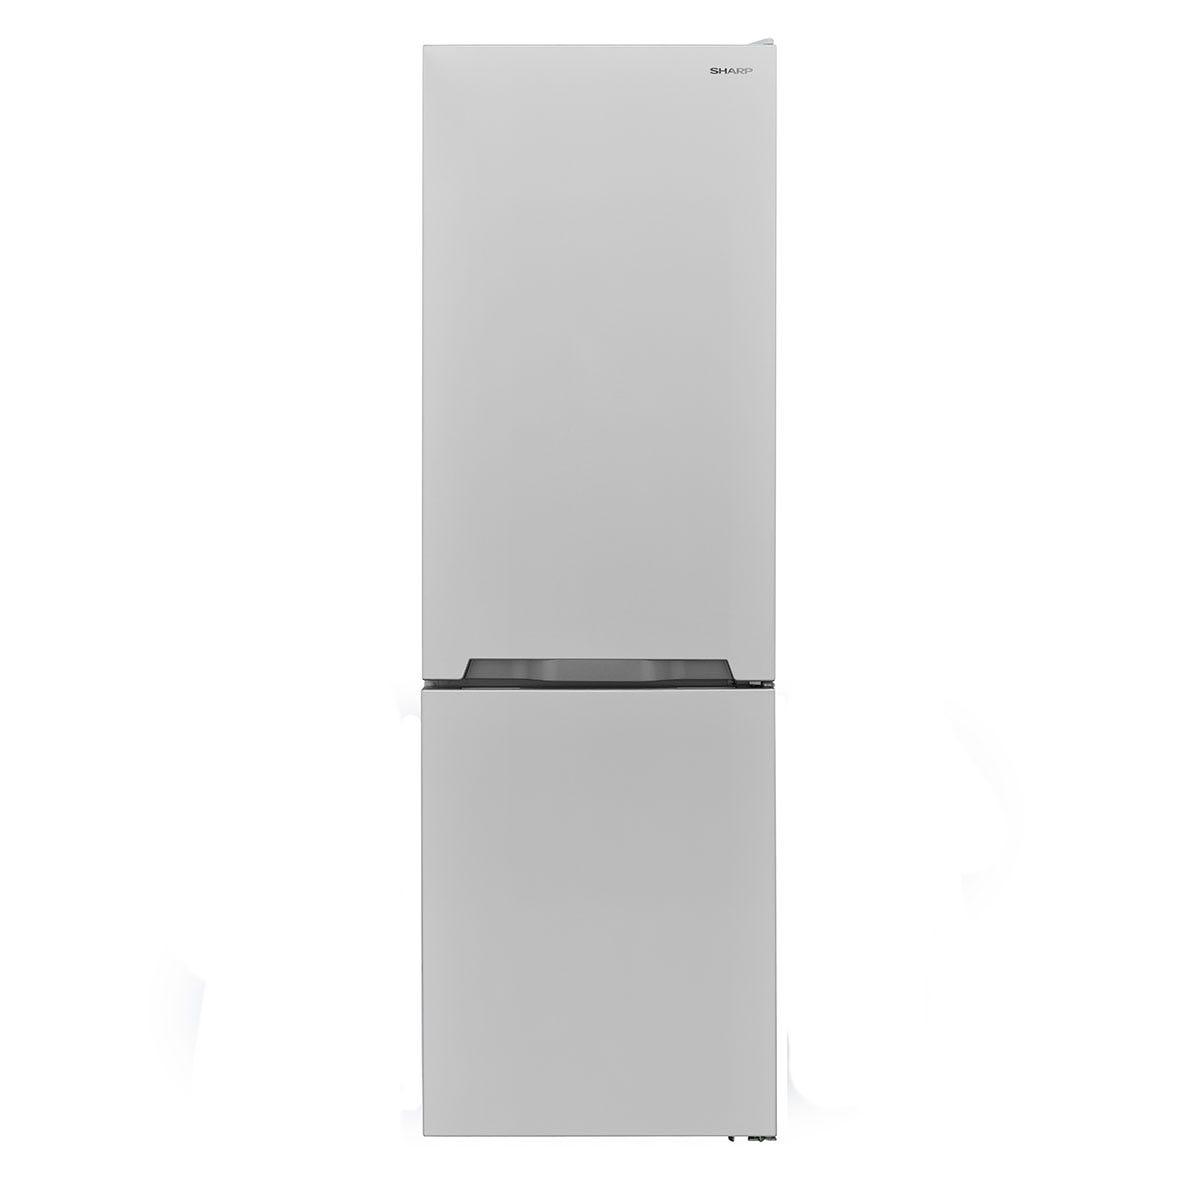 Sharp SJ-BB10IMXW1-EN FS 70/30 Combi Fridge Freezer with NanoFrost Technology - White